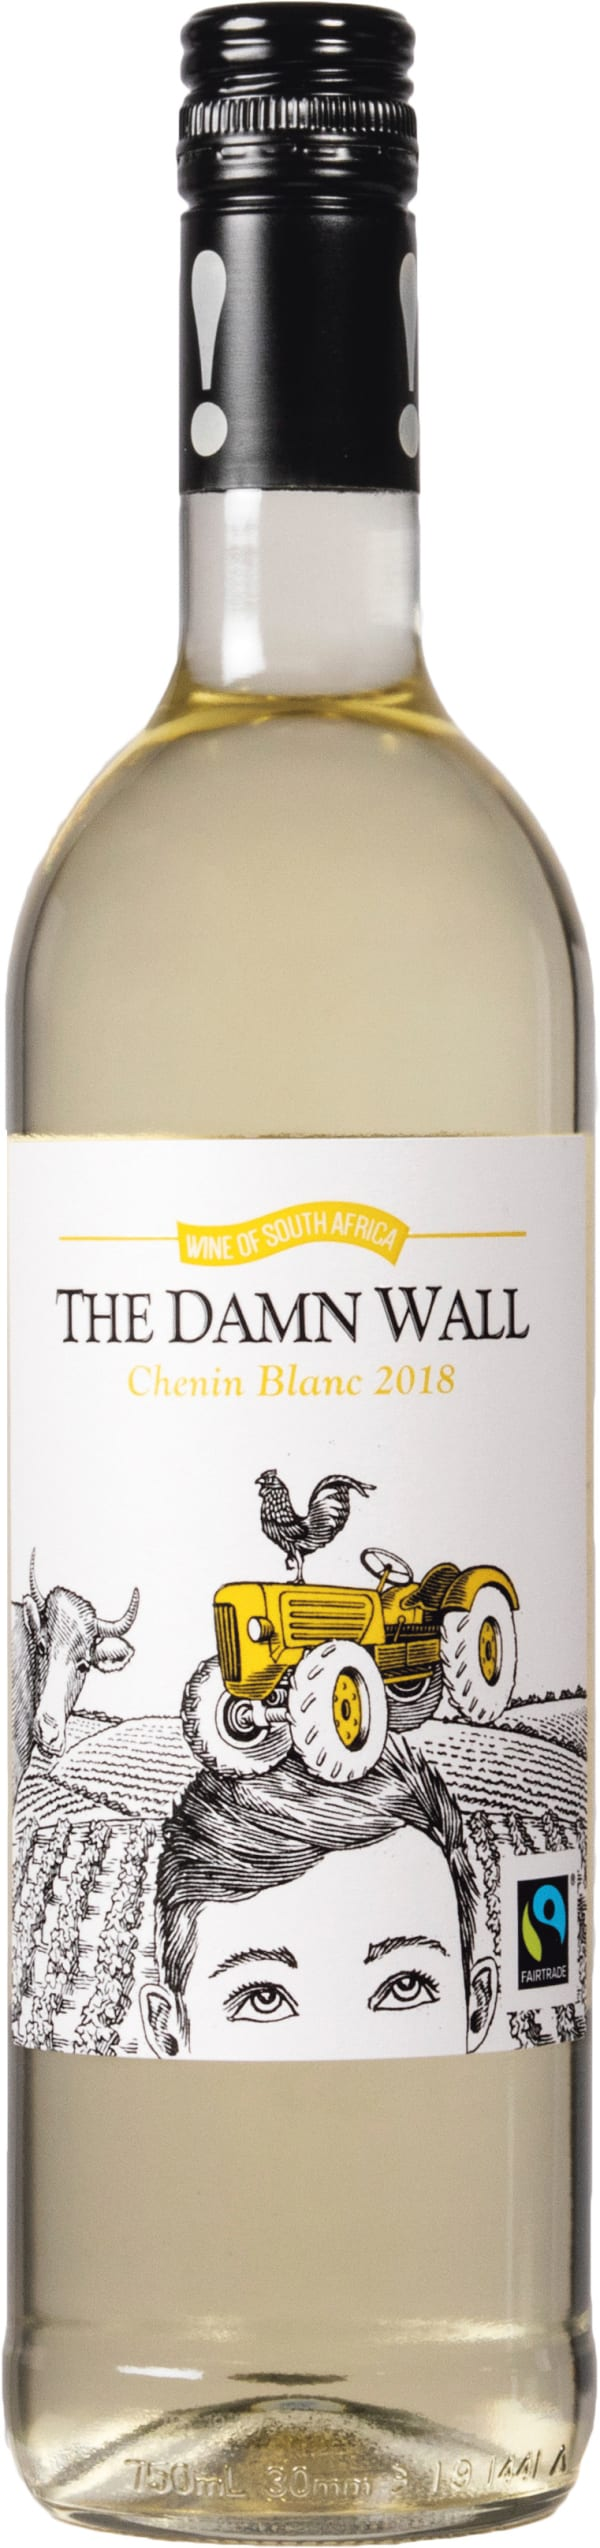 The Damn Wall Chenin Blanc 2018